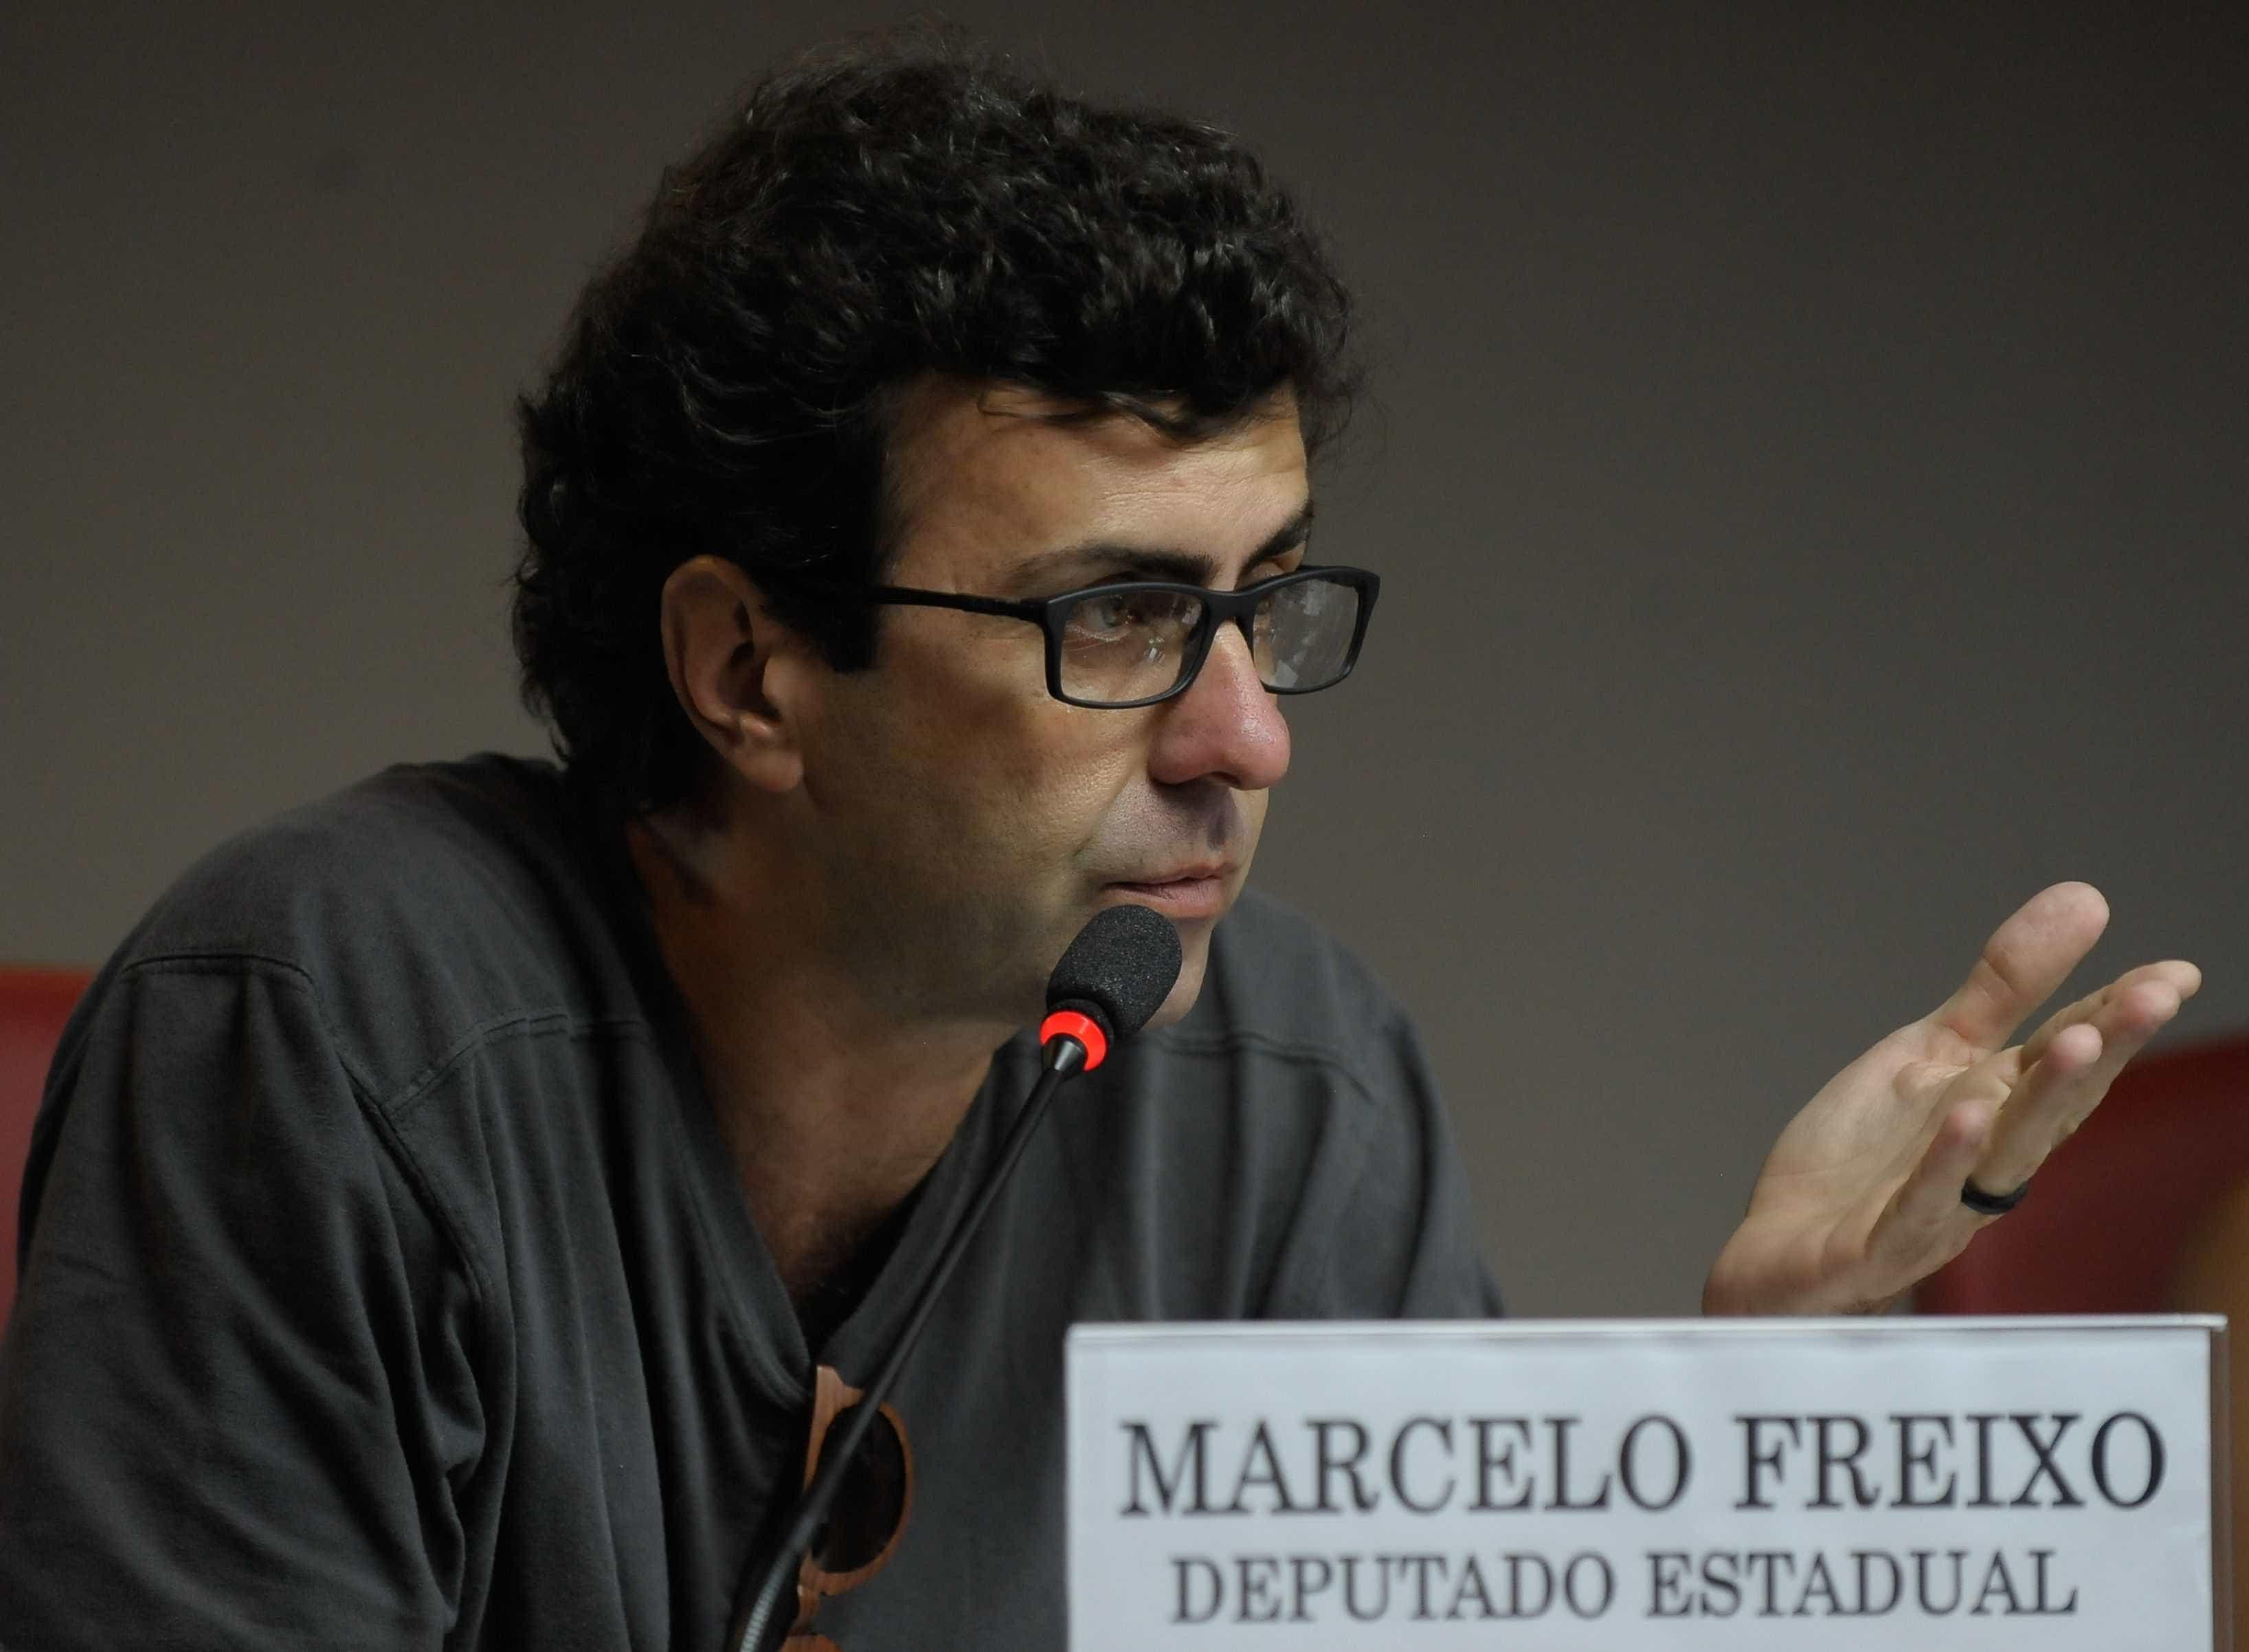 Polícia intercepta plano para matar deputado Marcelo Freixo no Rio